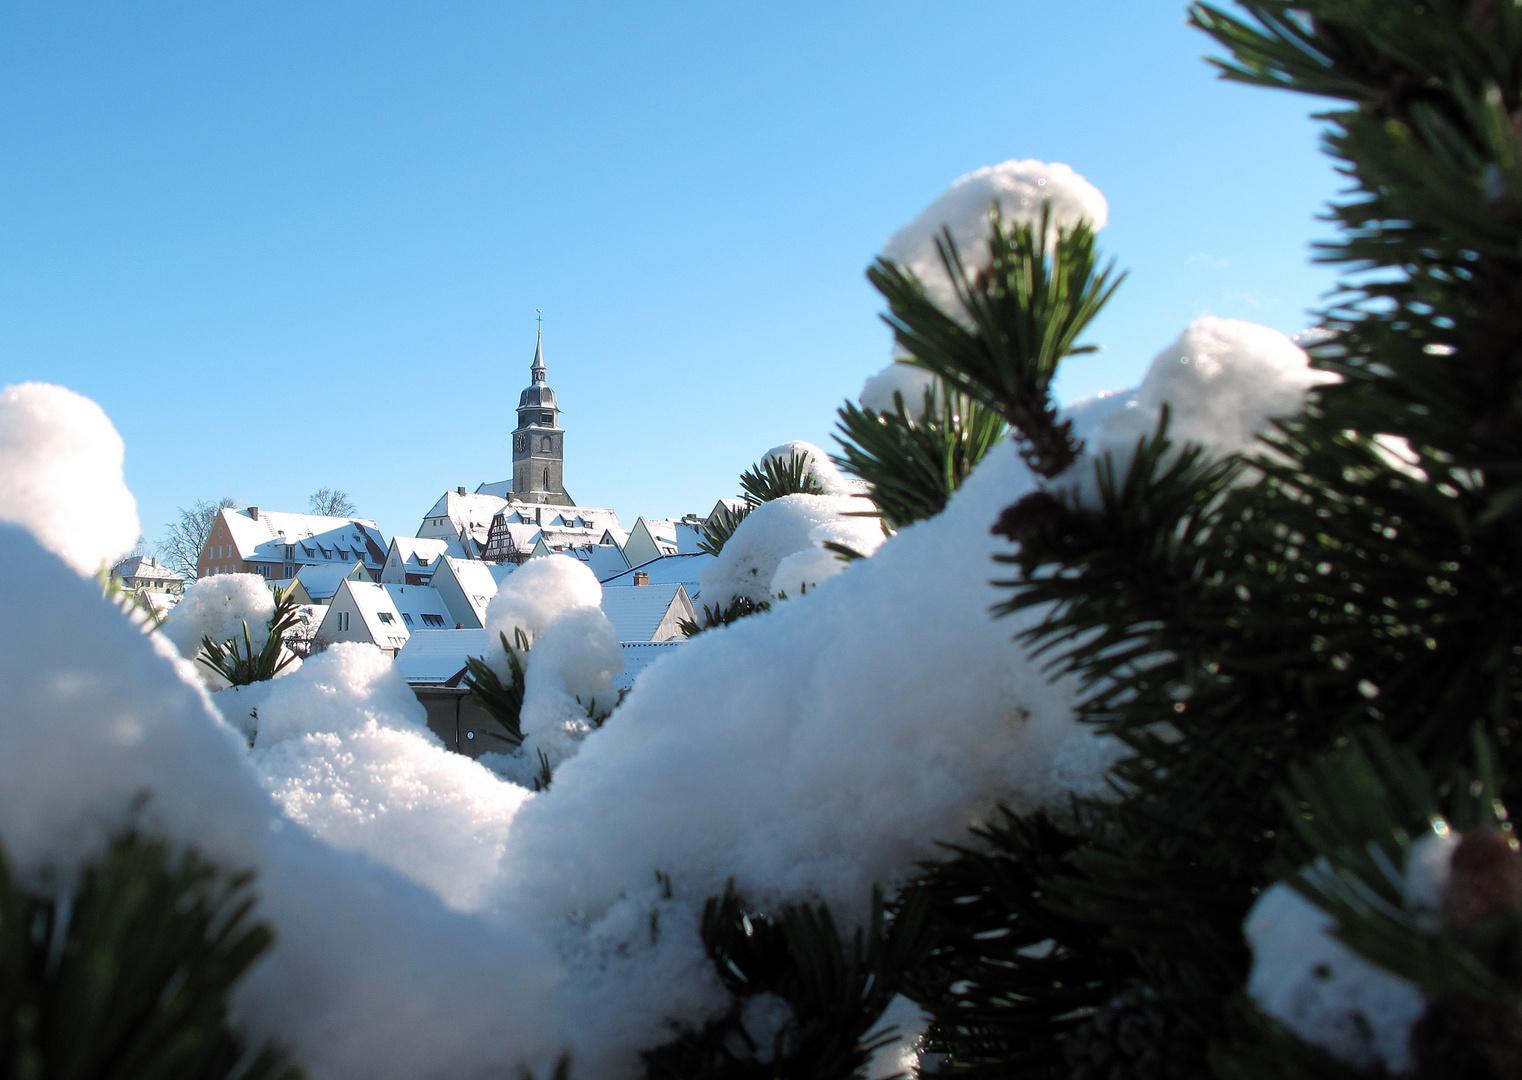 Stadtkirche BB im Winter